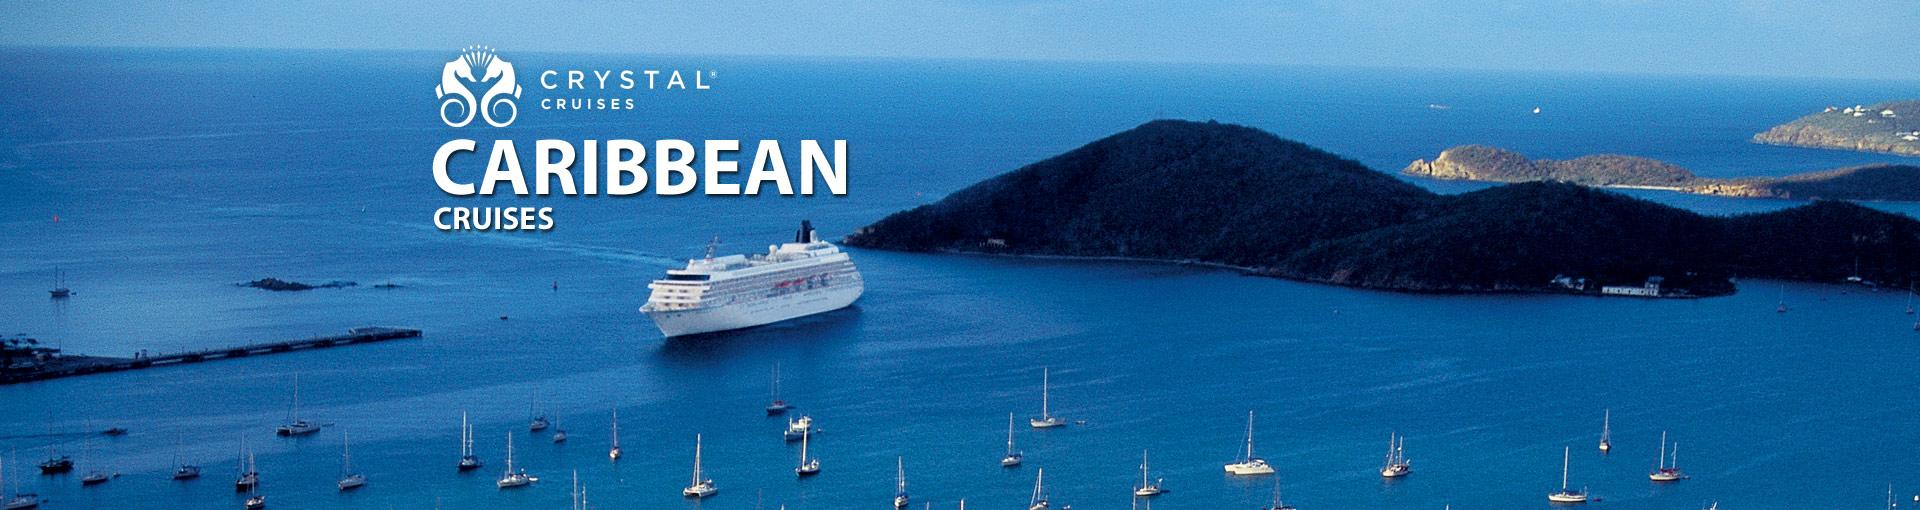 Crystal Cruises Caribbean Cruises